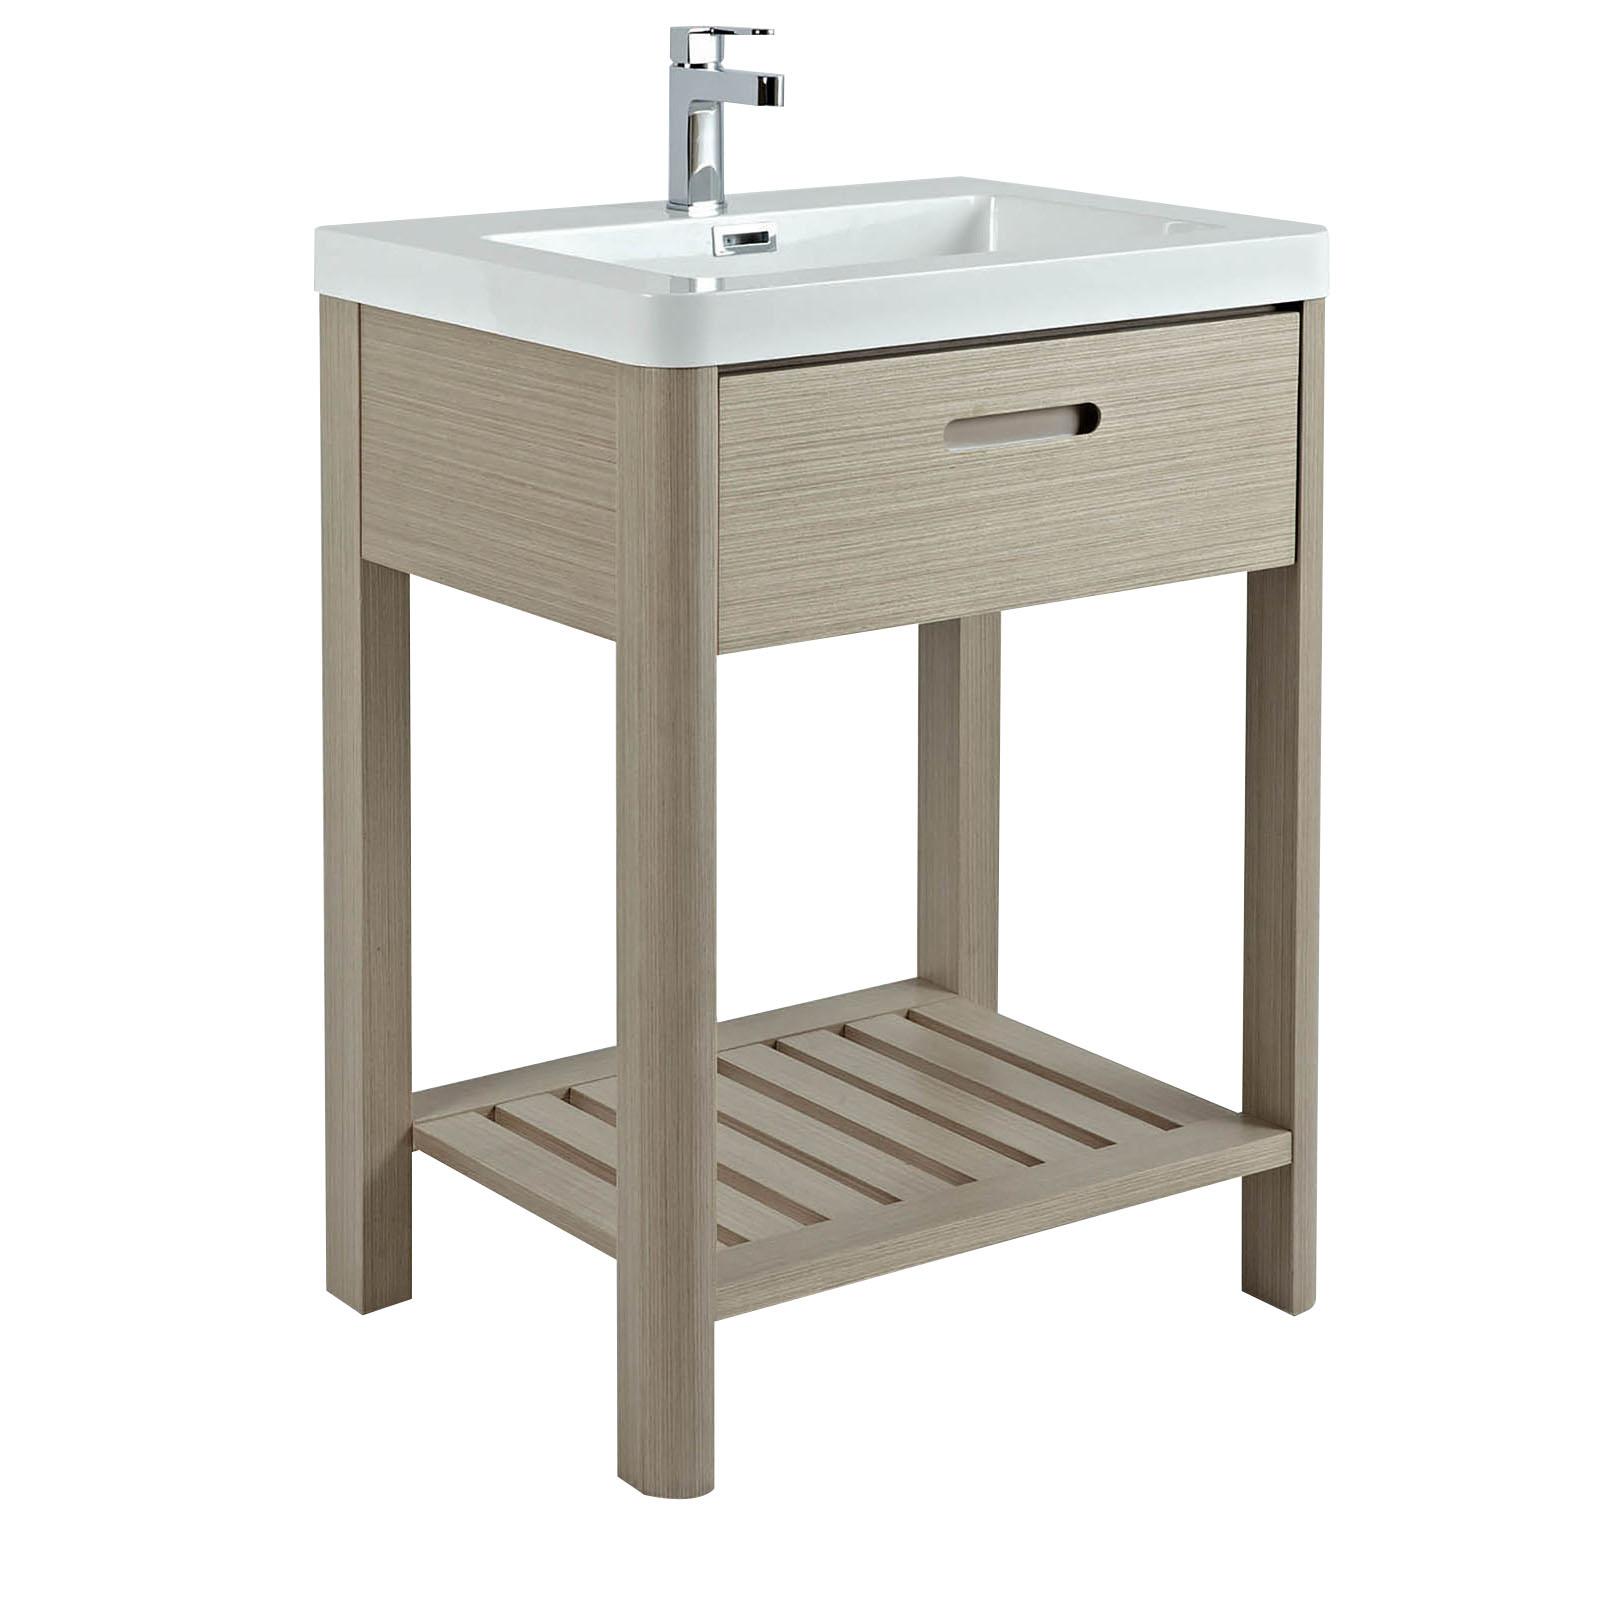 Megan Arcaccia Wash Stand Unit Amp Basin H Amp V Bathrooms Amp Tiles